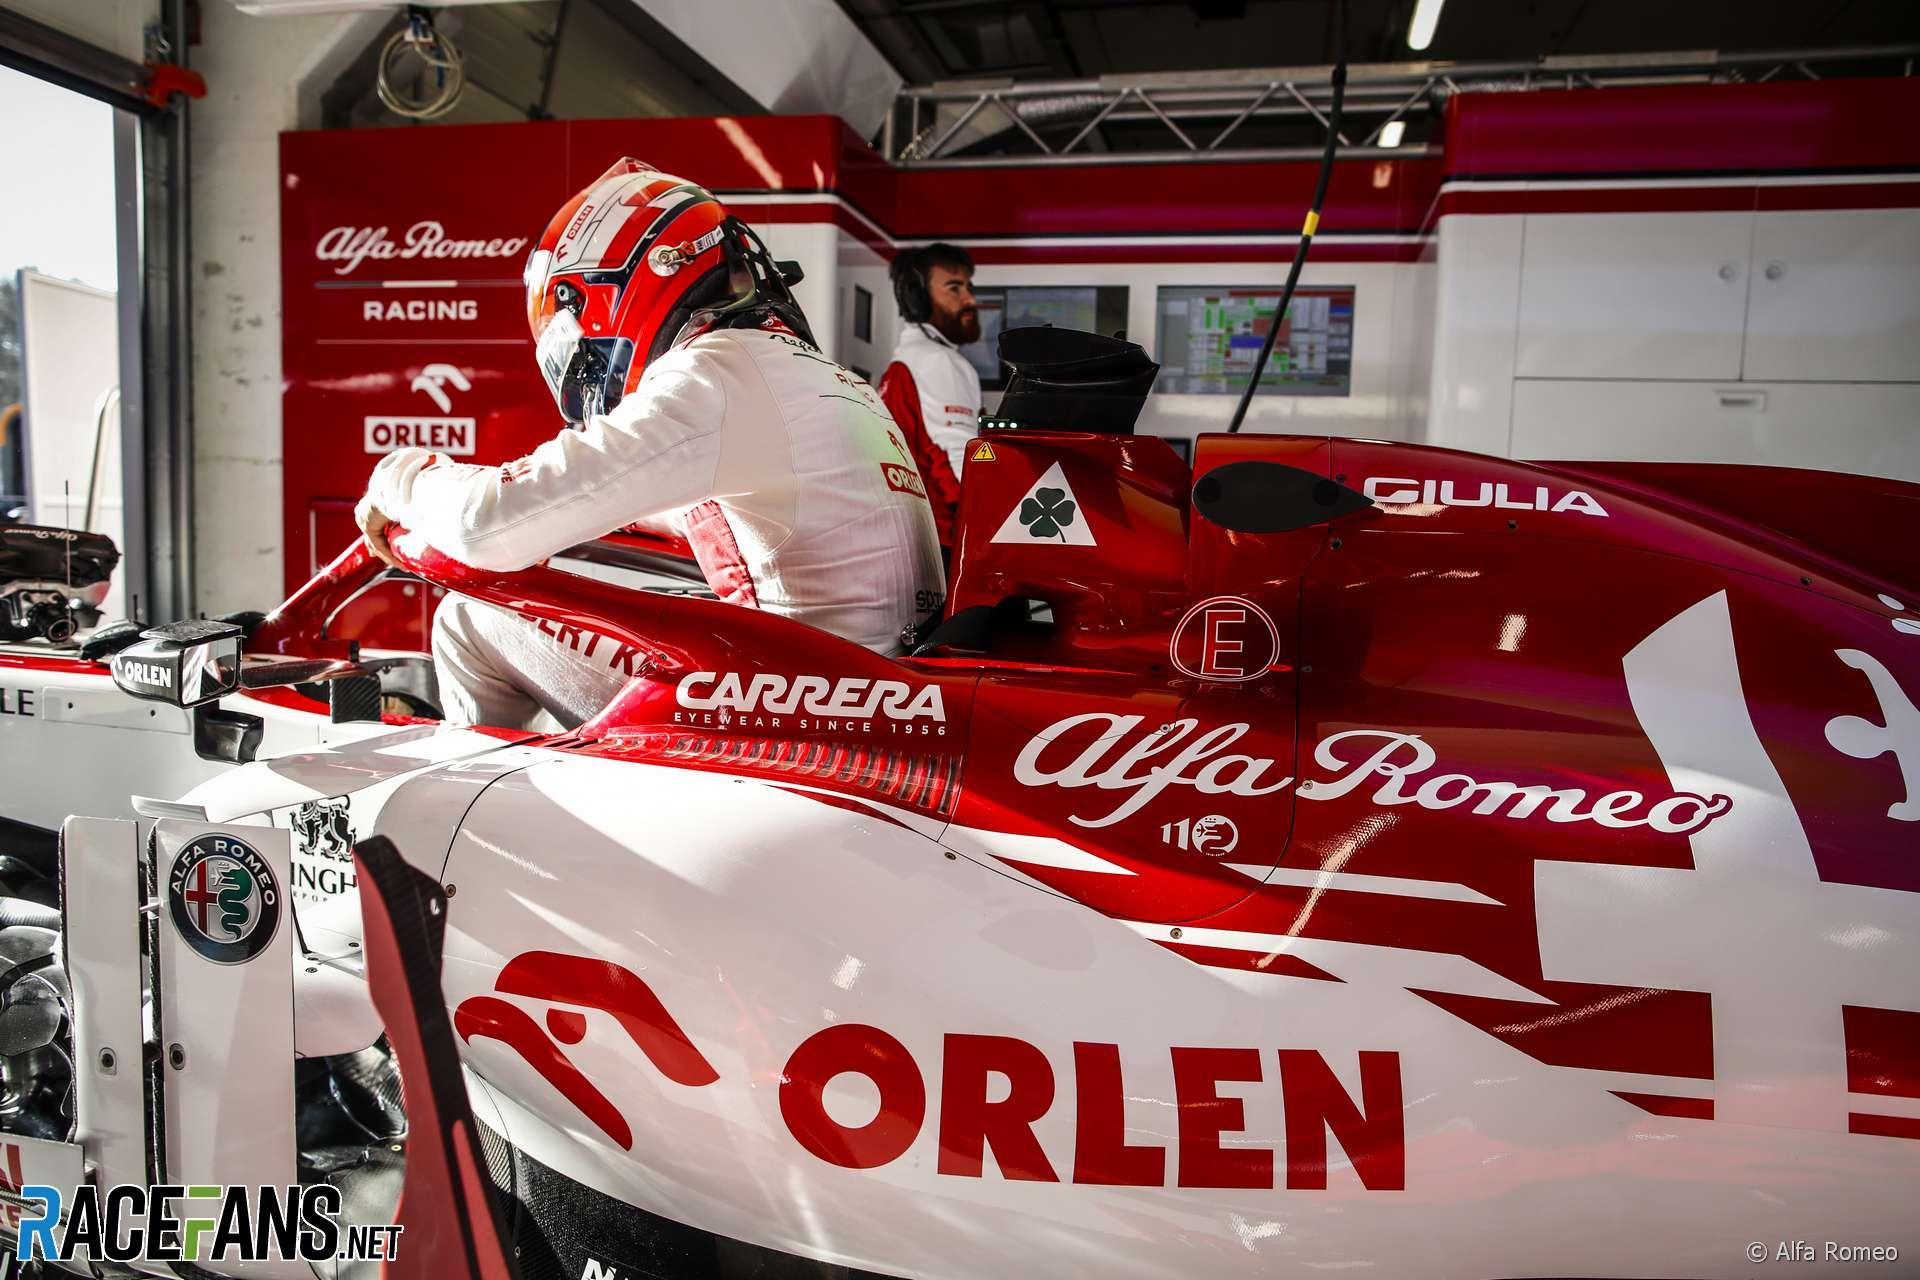 Robert Kubica, Alfa Romeo, Circuit de Catalunya, 2020